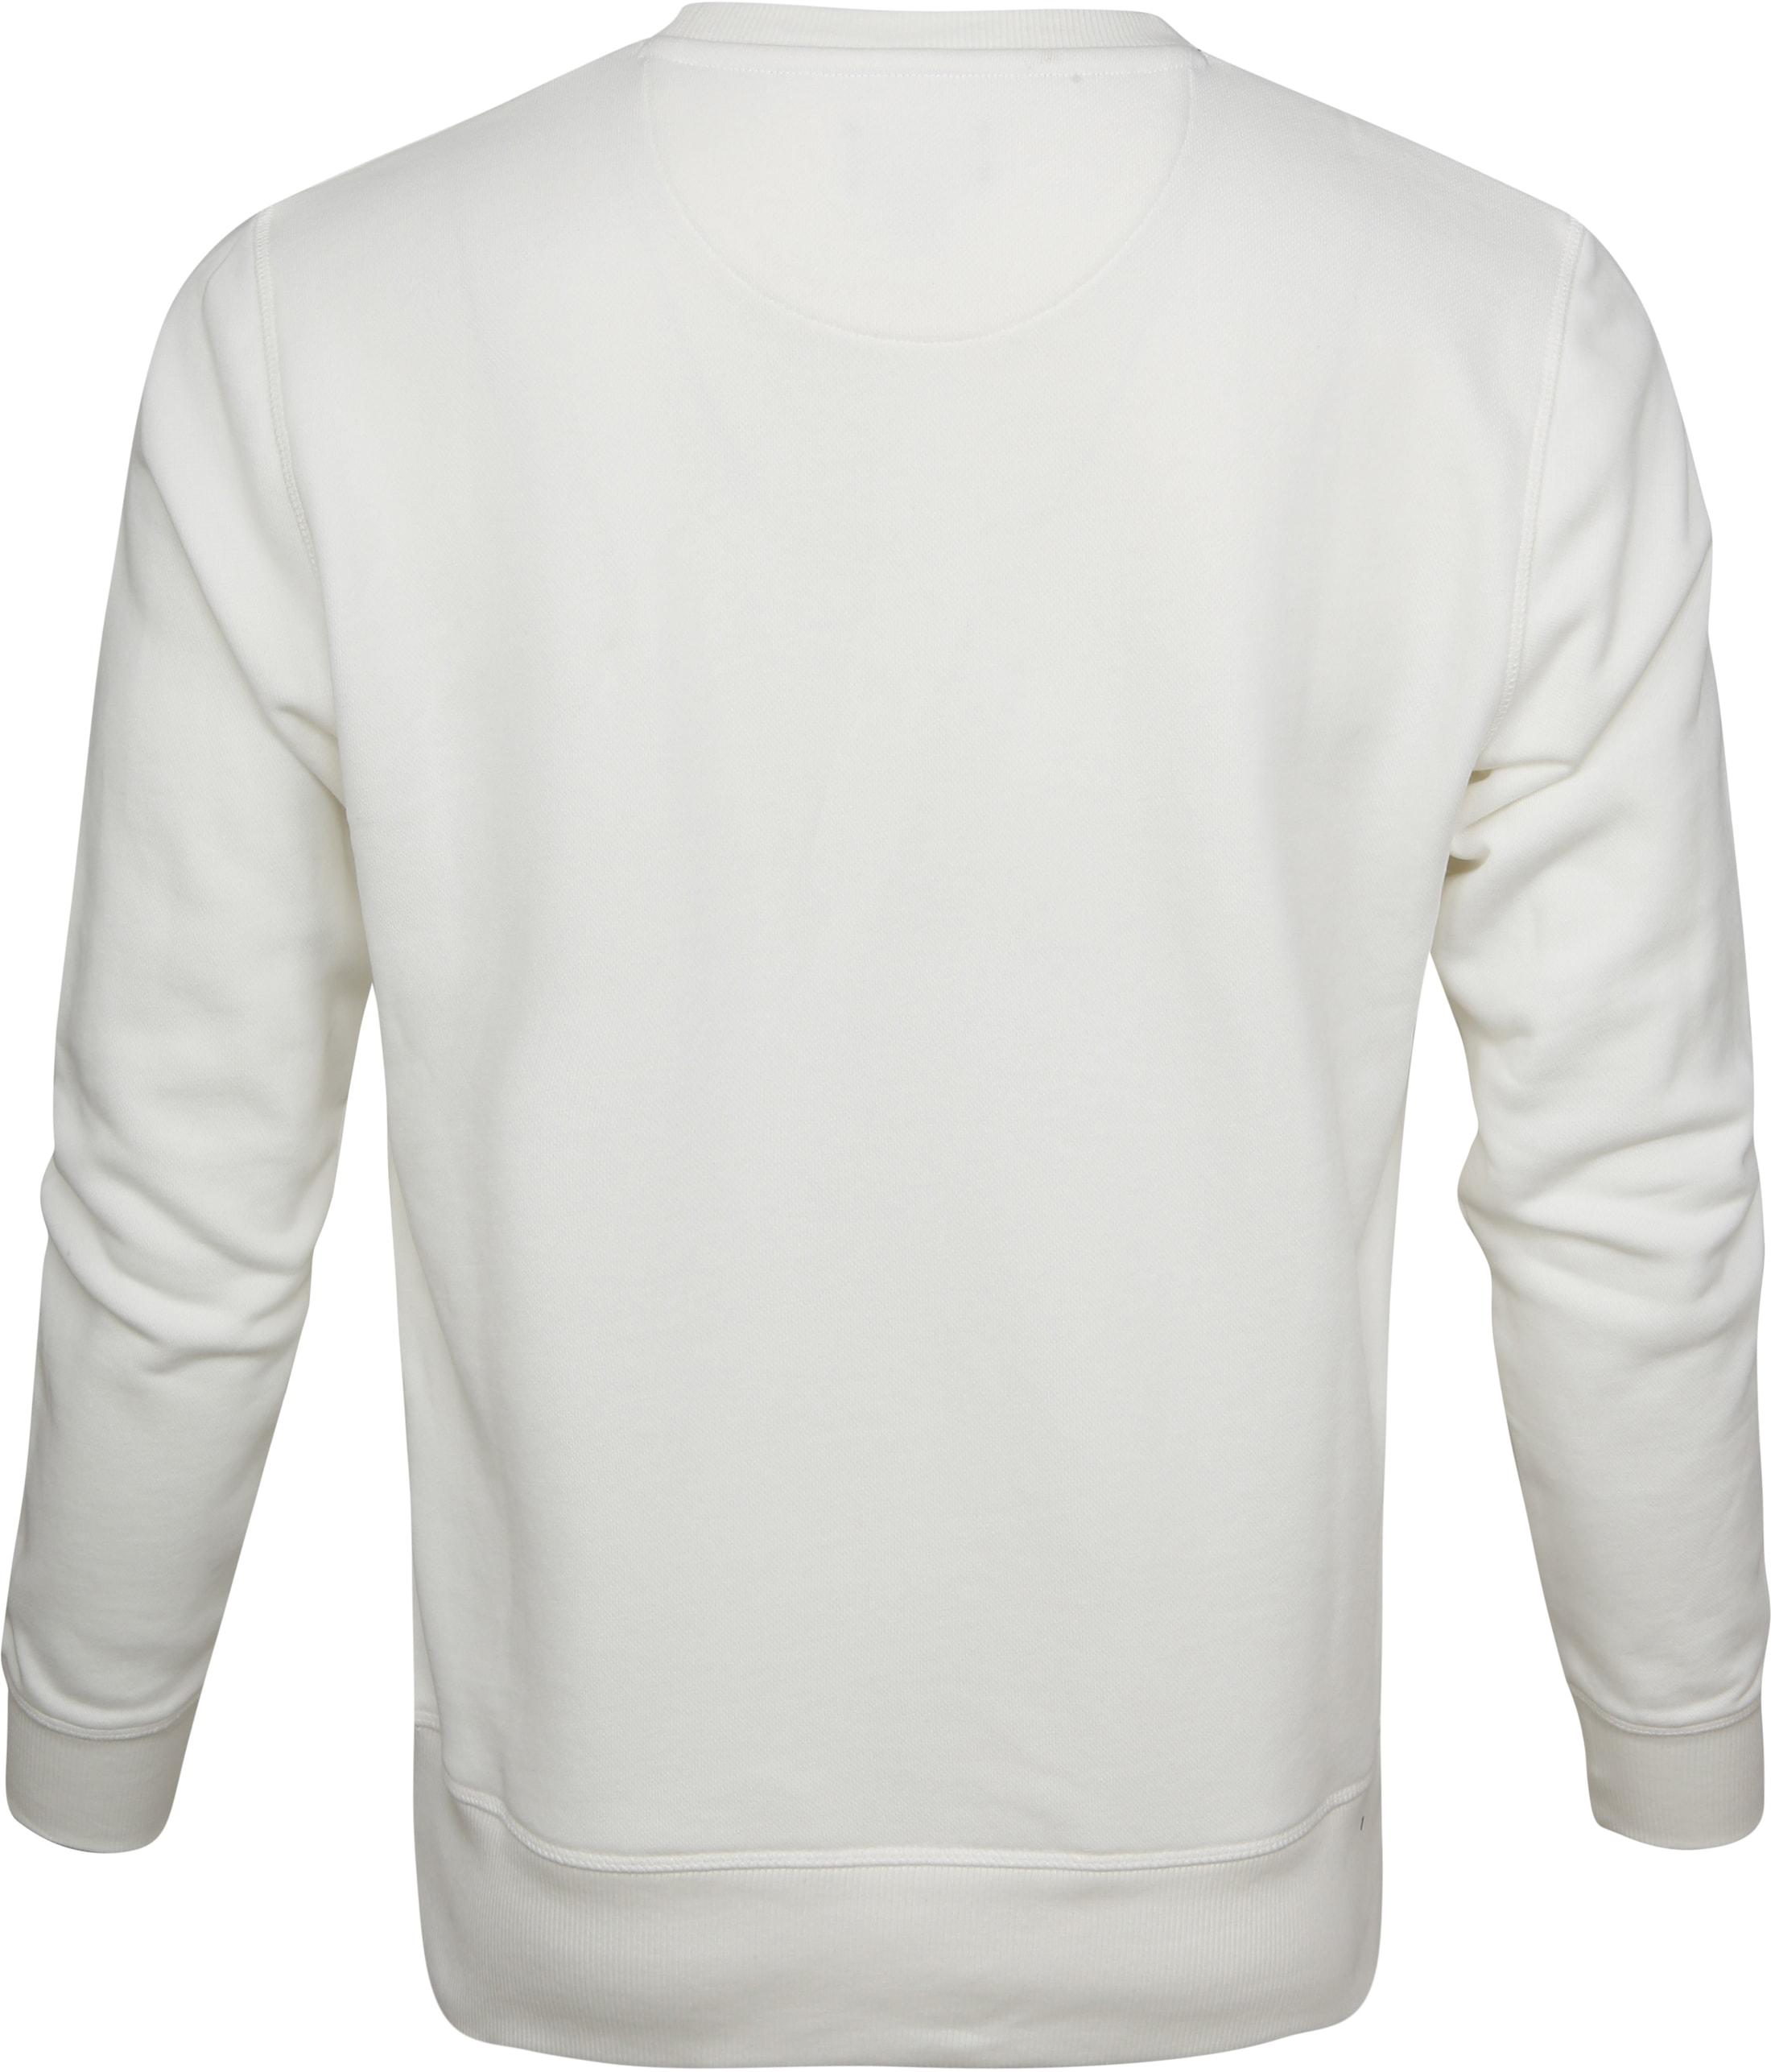 Gant Sweater Off-White foto 2